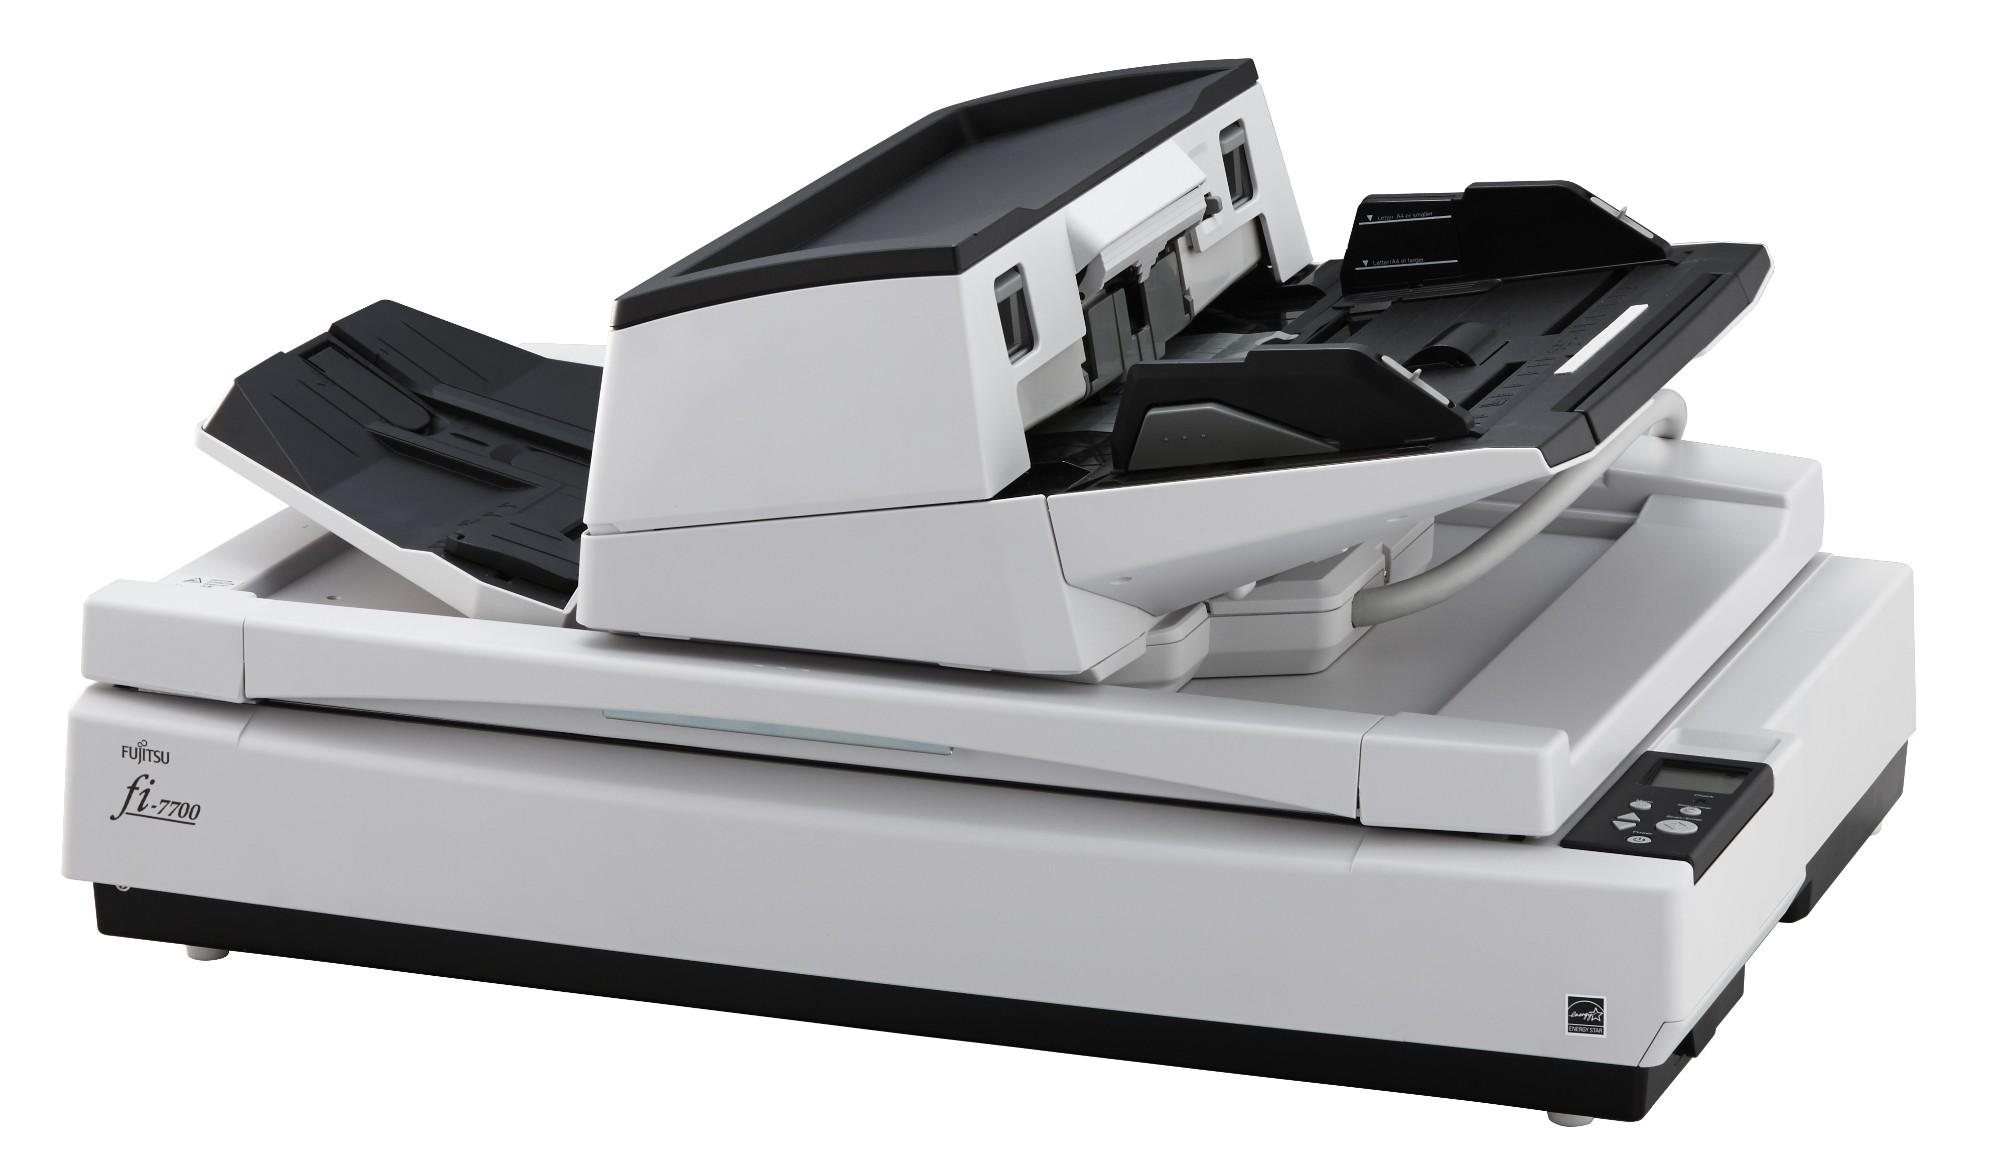 Fujitsu fi-7700 Flatbed & ADF 600 x 600DPI A3 Black,White PA03740-B001